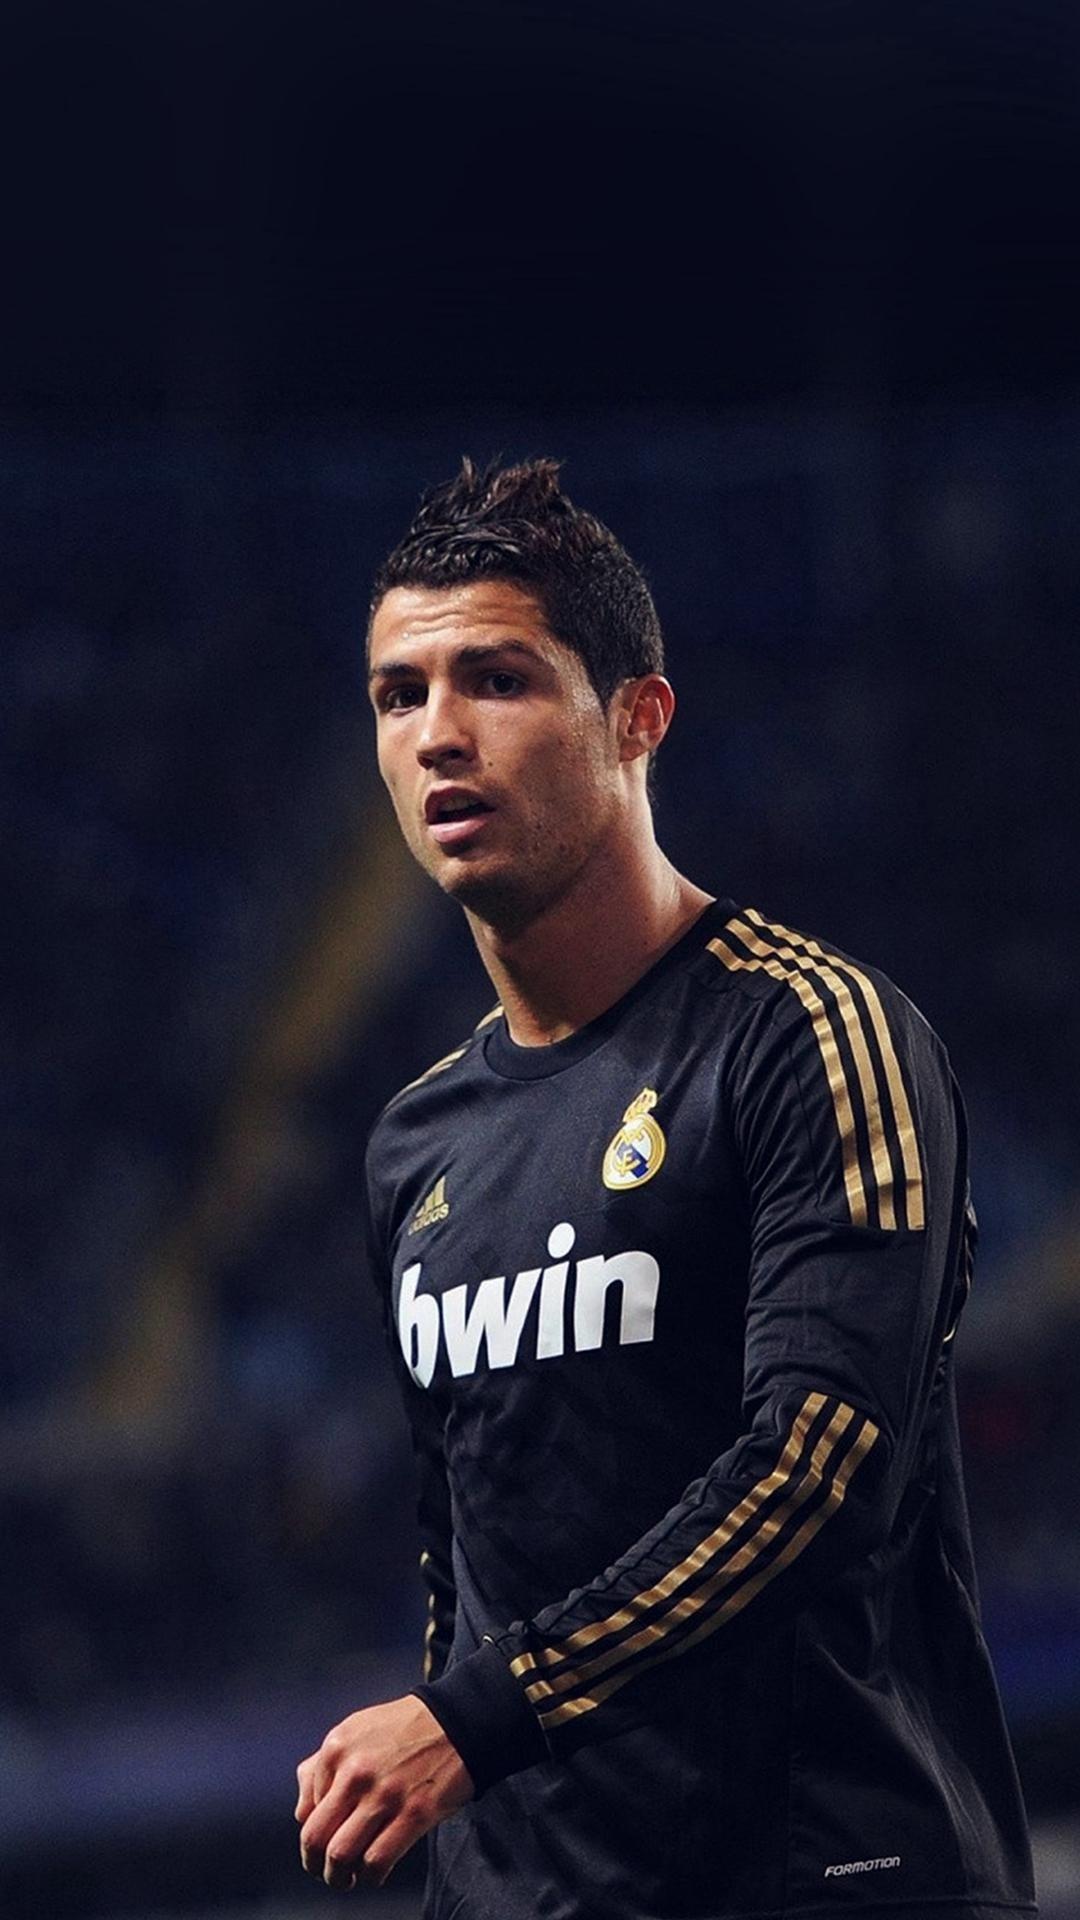 wallpaper.wiki-Ronaldo-Christiano-Soccer-Star-iphone-6-